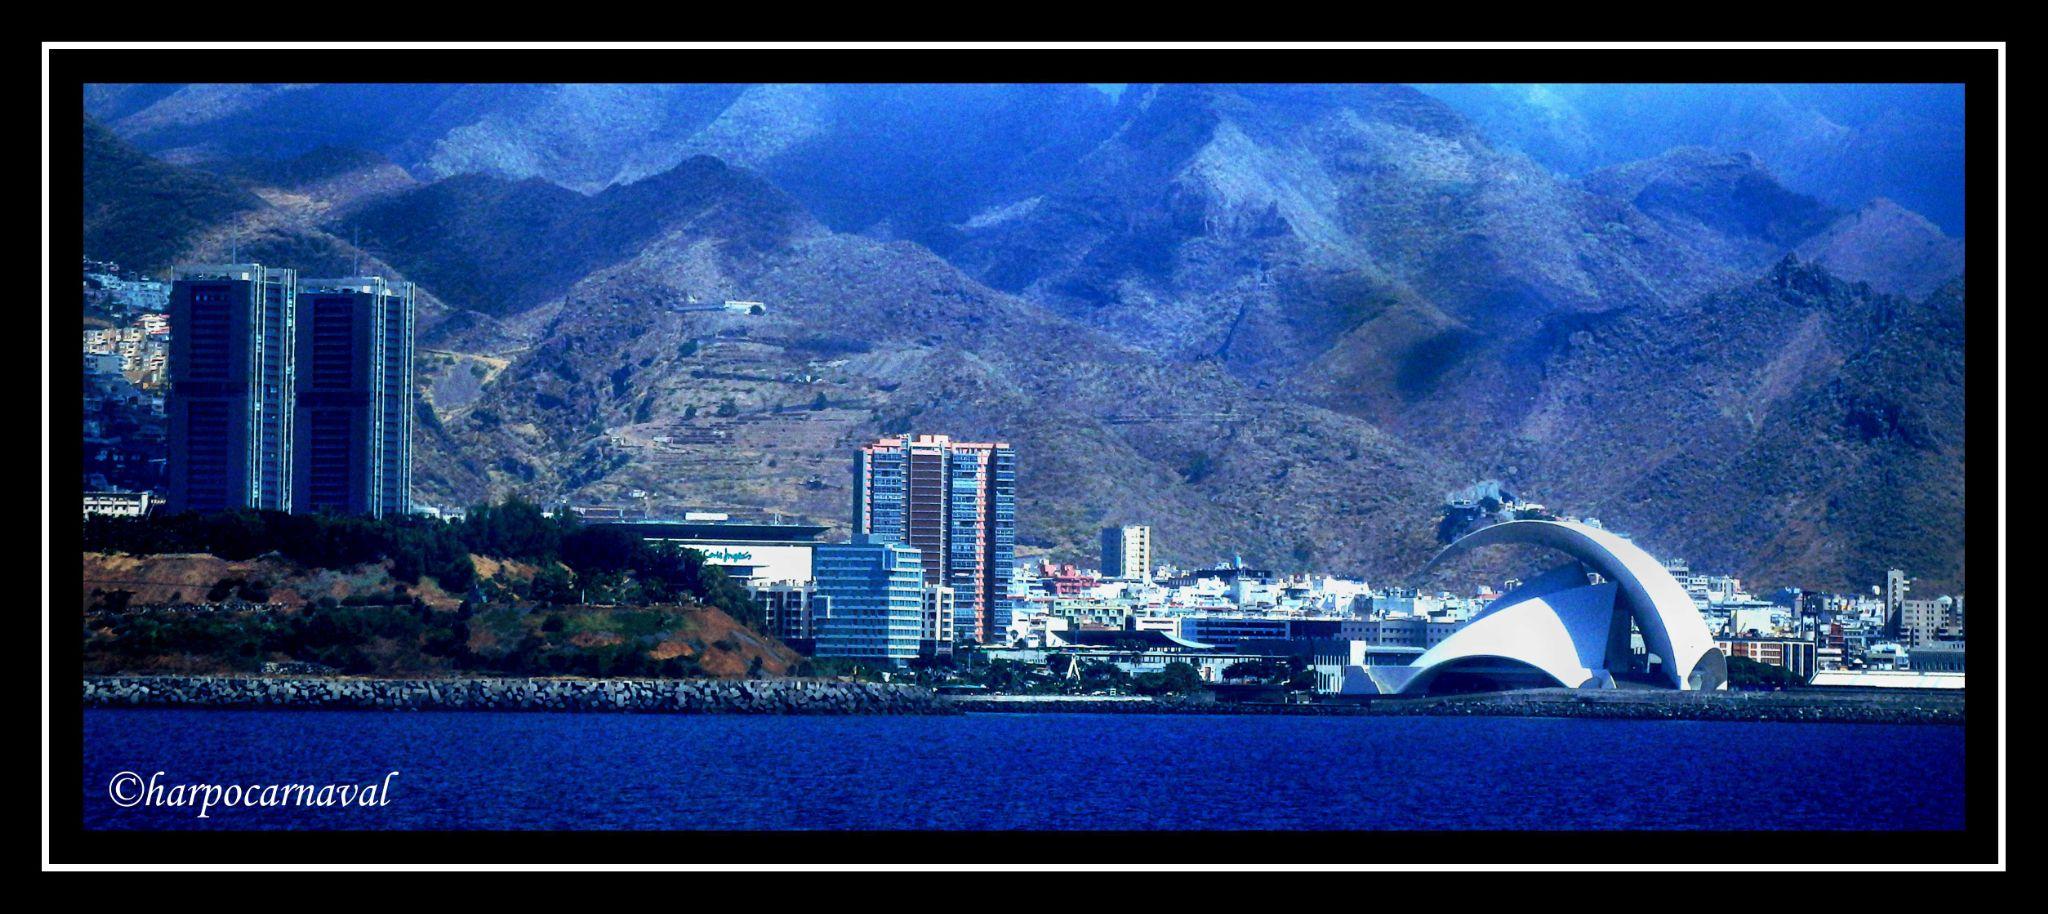 Santa Cruz de Tenerife city by Harpocarnaval Photography